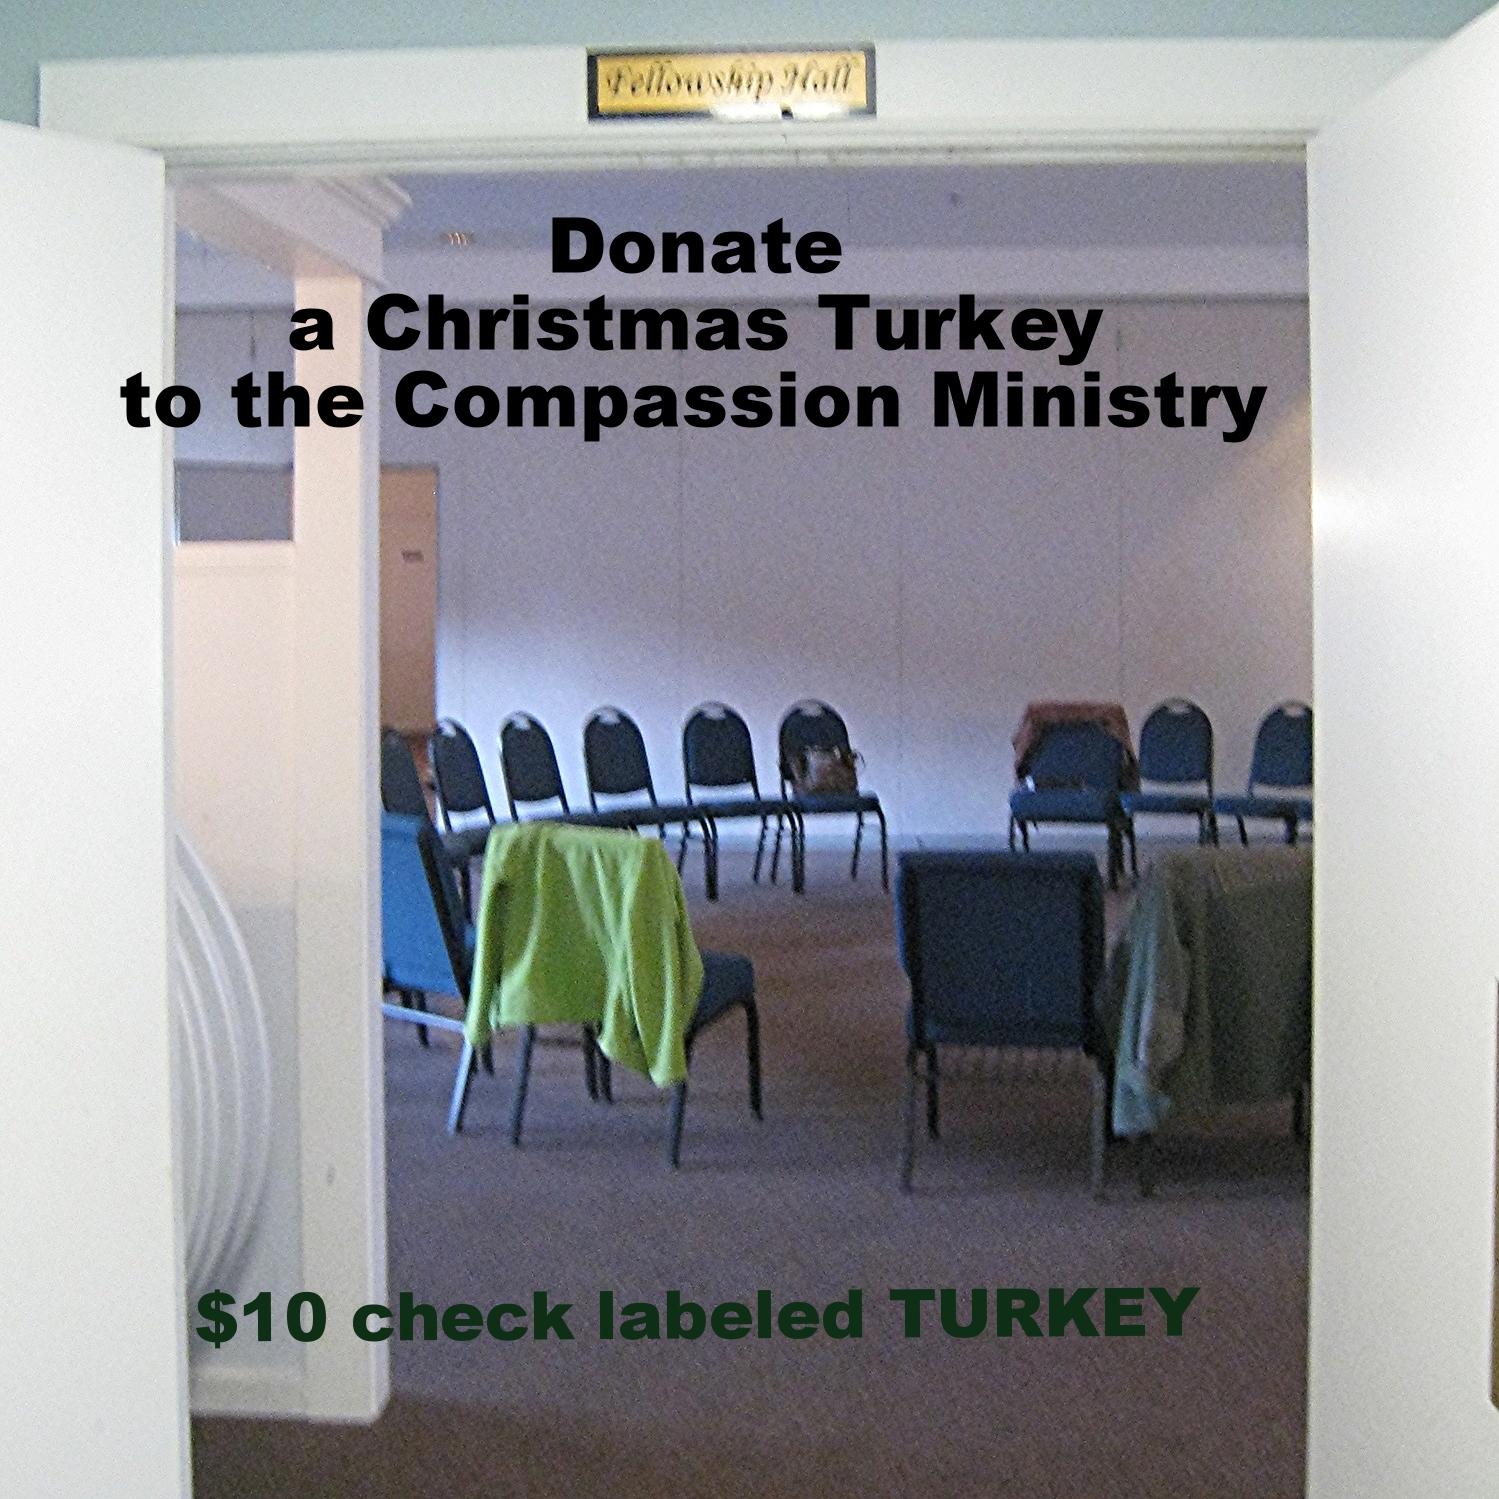 Donate Christmas Turkeys